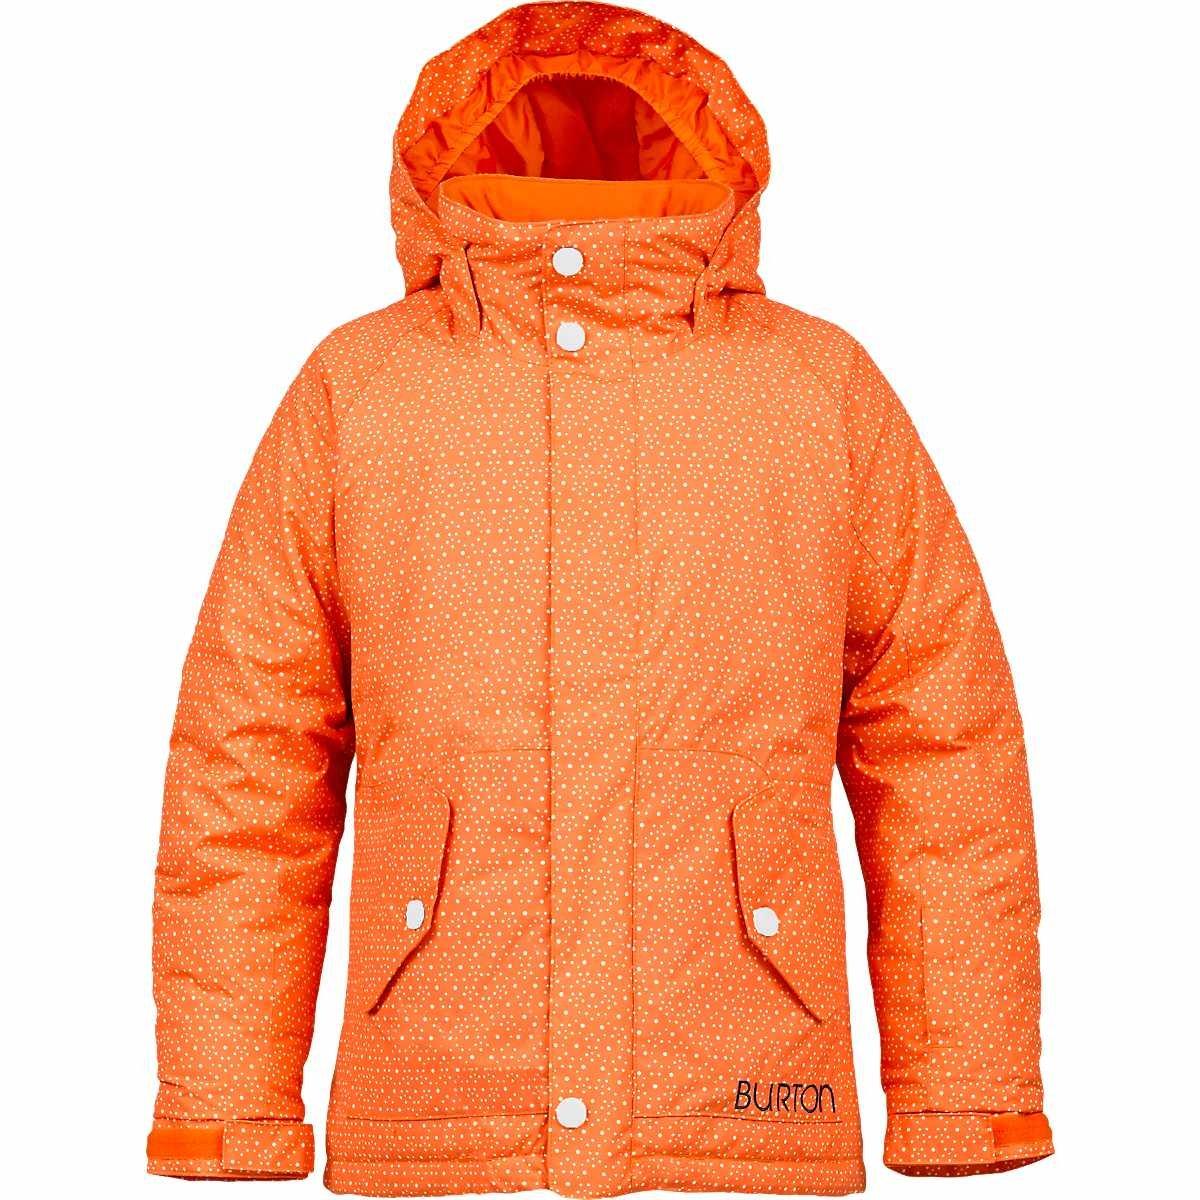 Burton Mädchen Snowboardjacke Girls Moxie Jacket kaufen